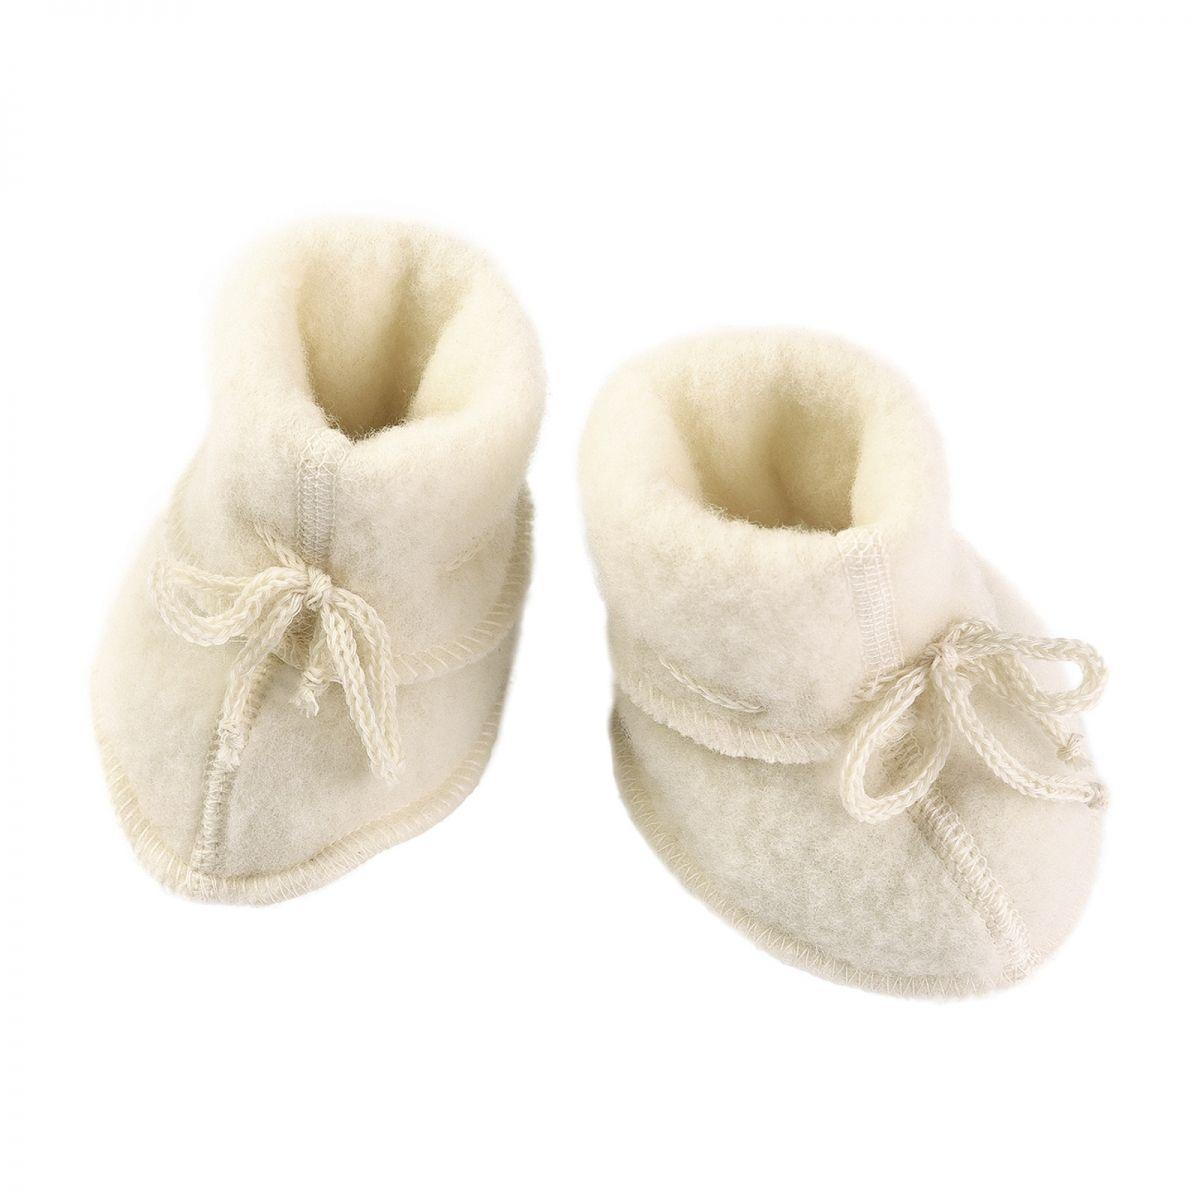 ENGEL Baby-bootees with ribbon natural